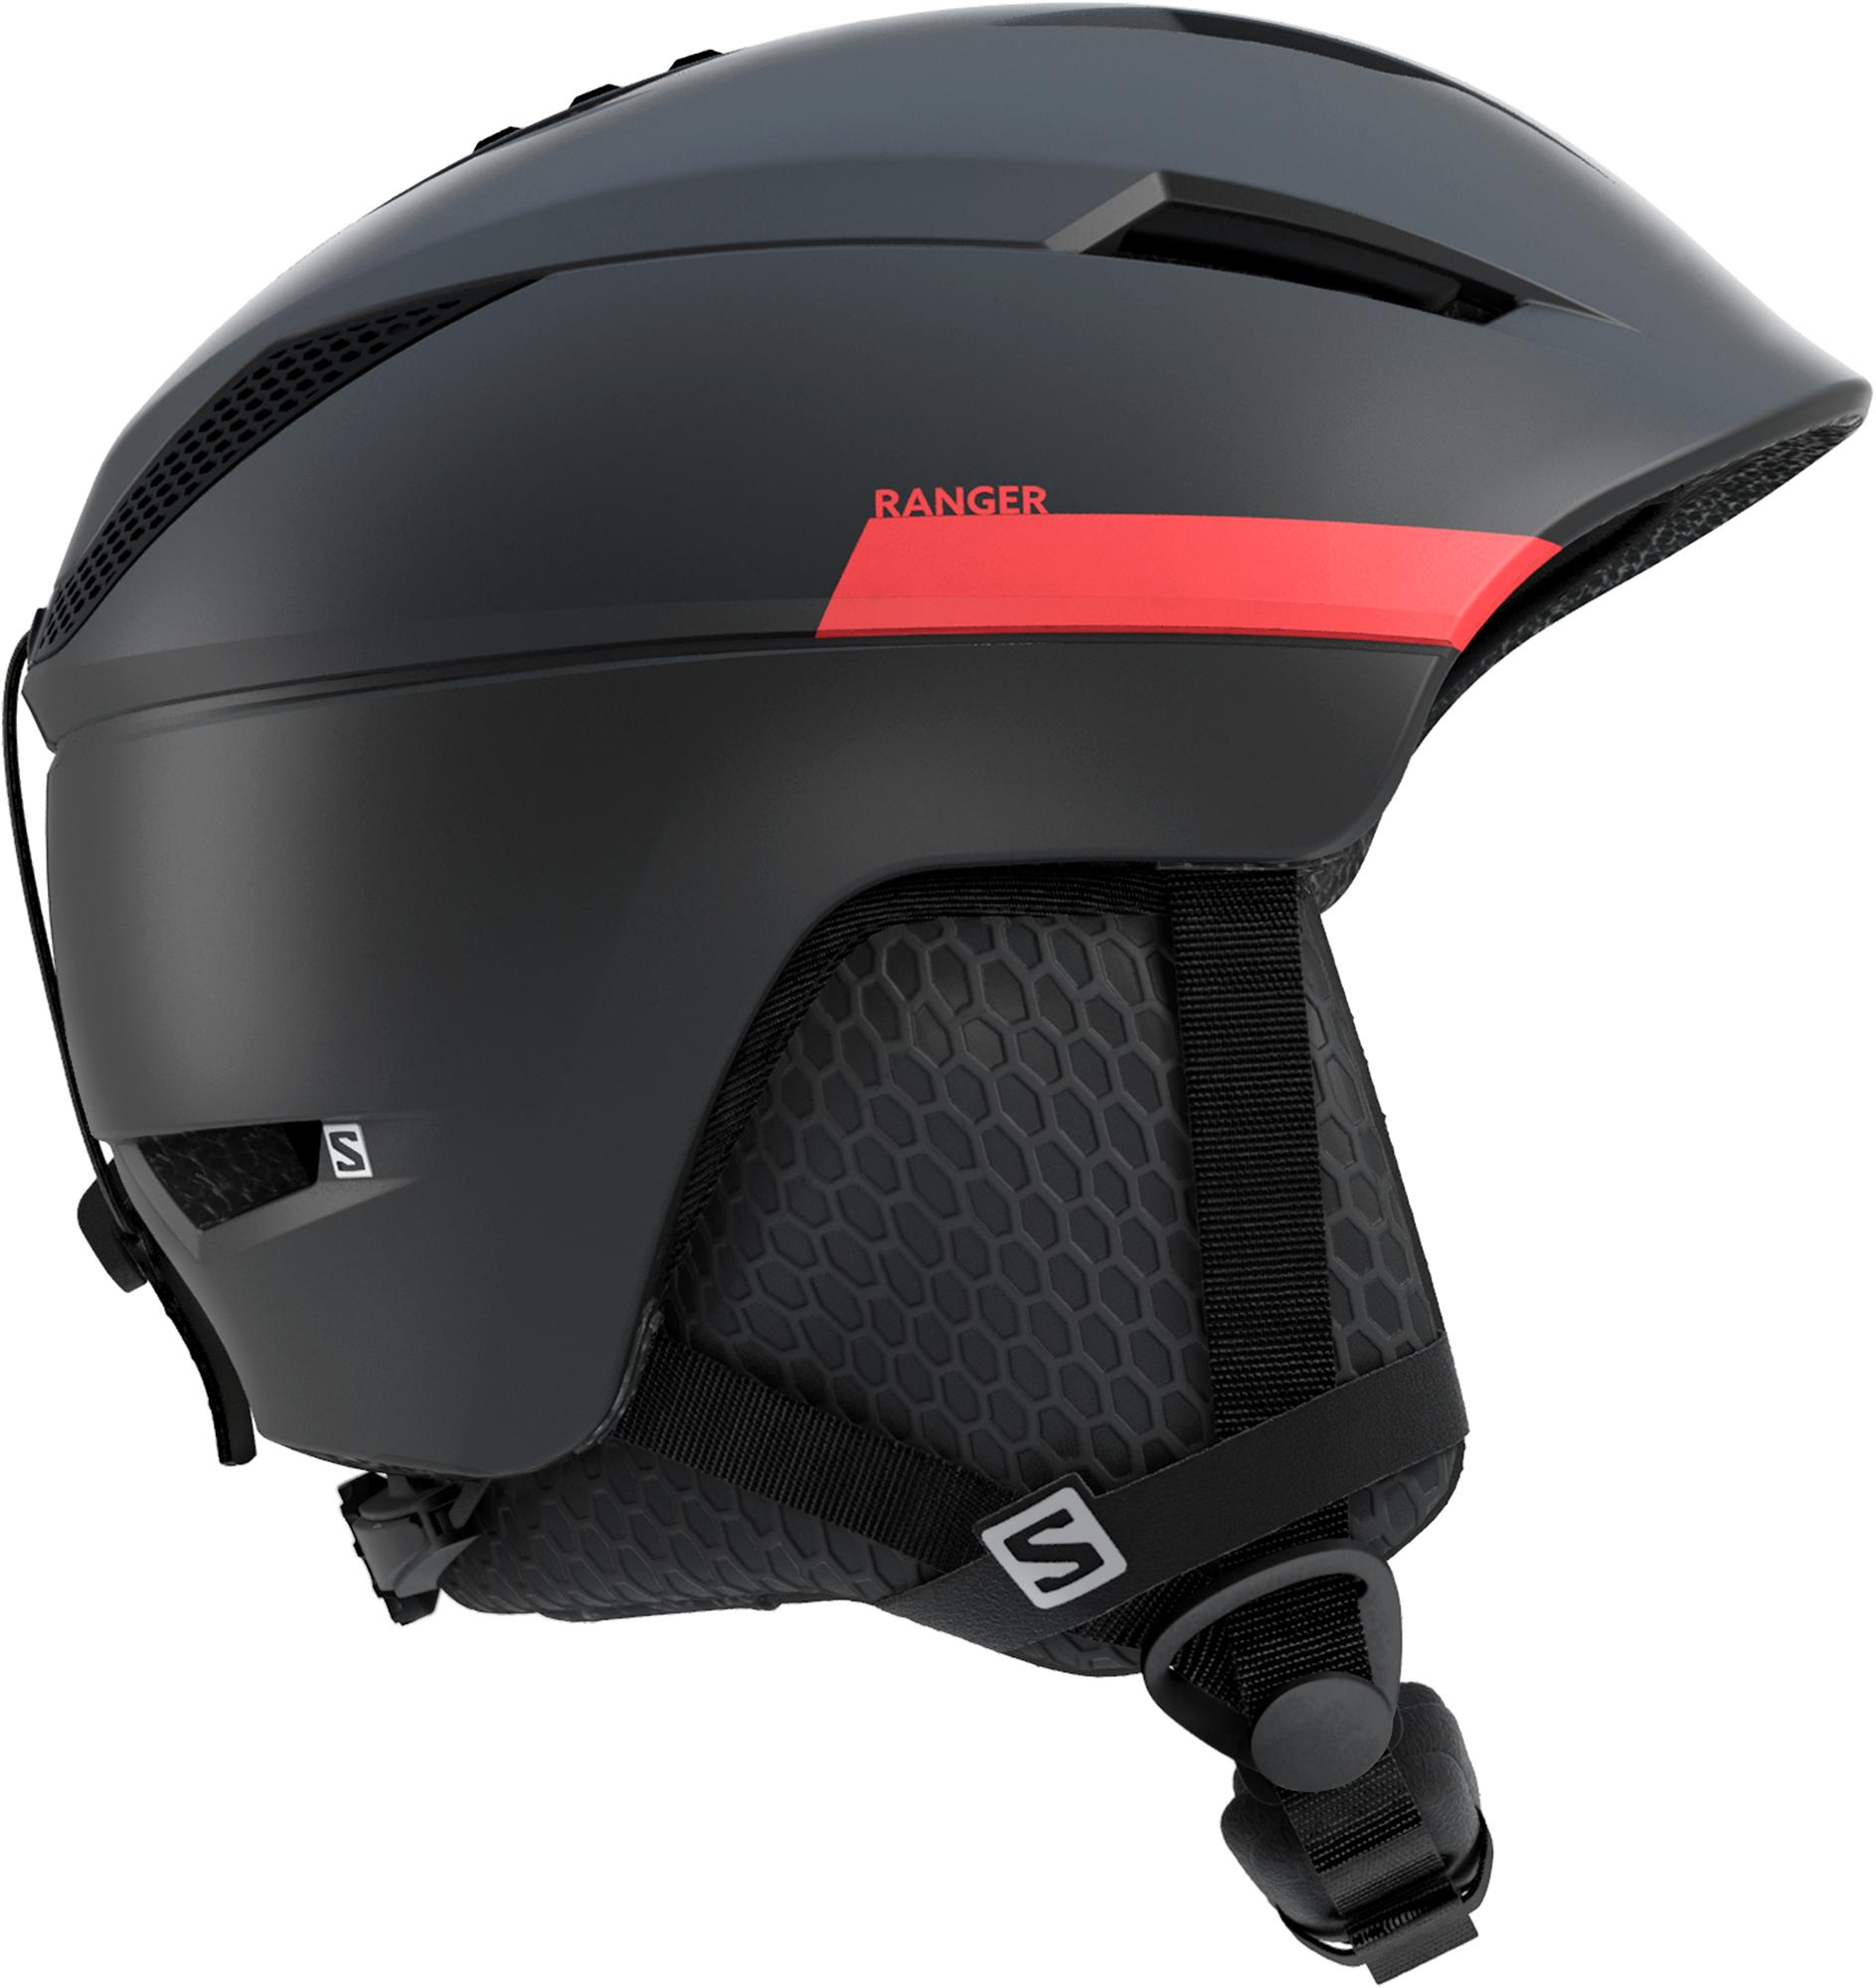 цена Salomon Шлем Salomon Ranger